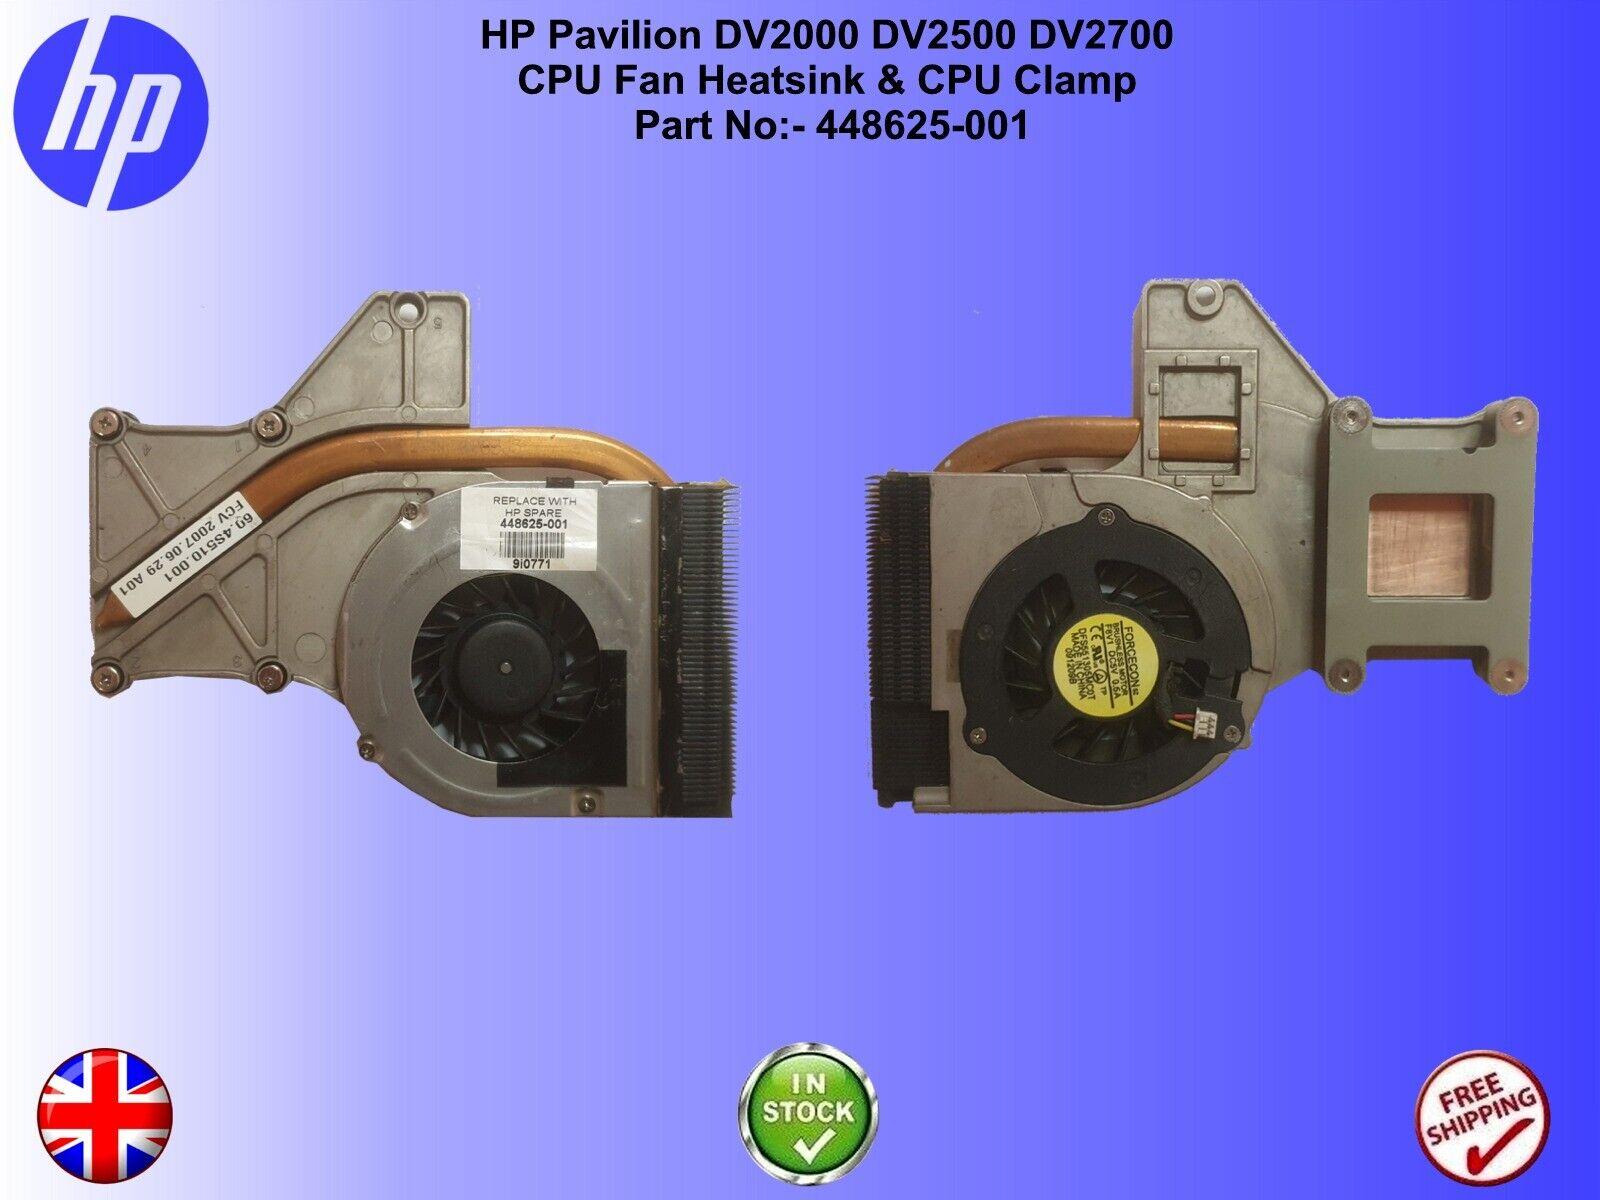 ⭐HP Pavilion DV2000 DV2500 DV2700 ⭐ CPU Fan & Heatsink Part No:- 448625-001